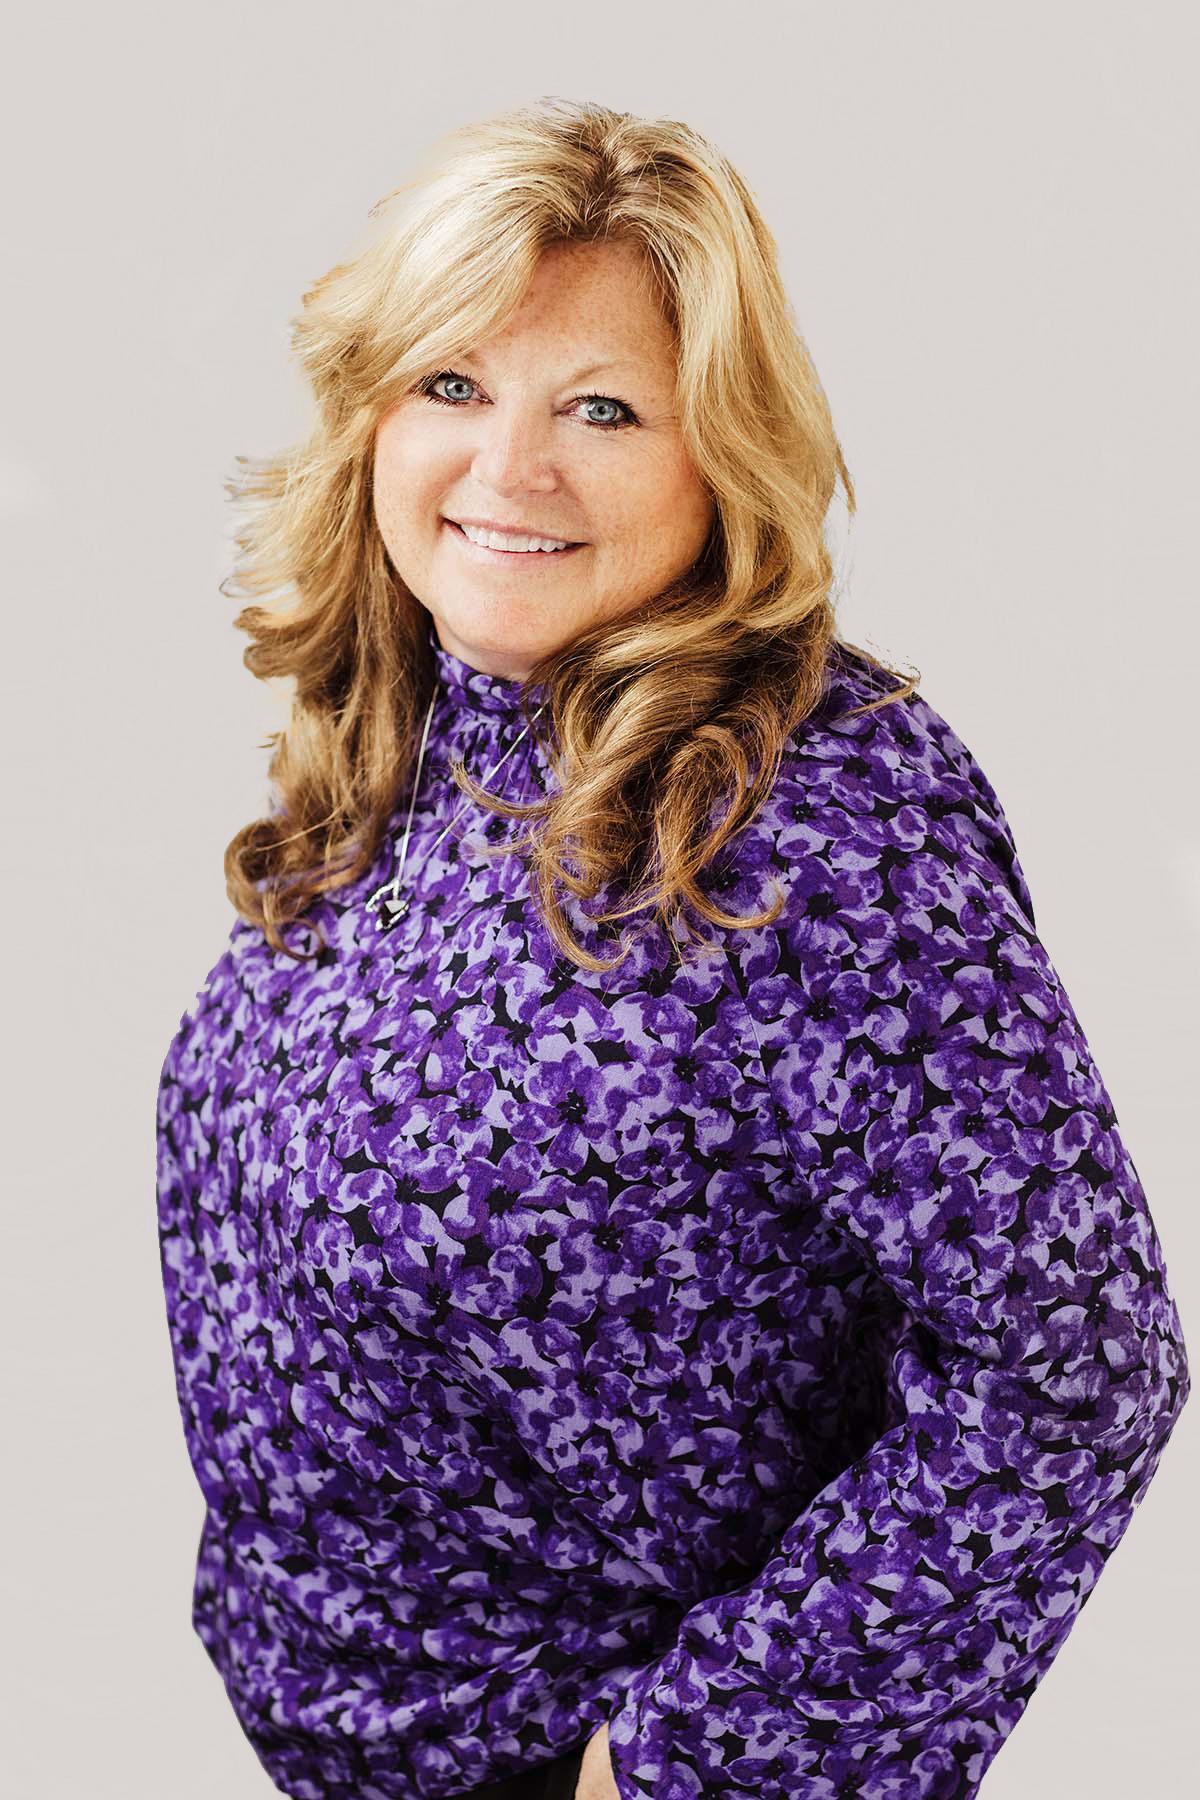 Lori VanSlyke